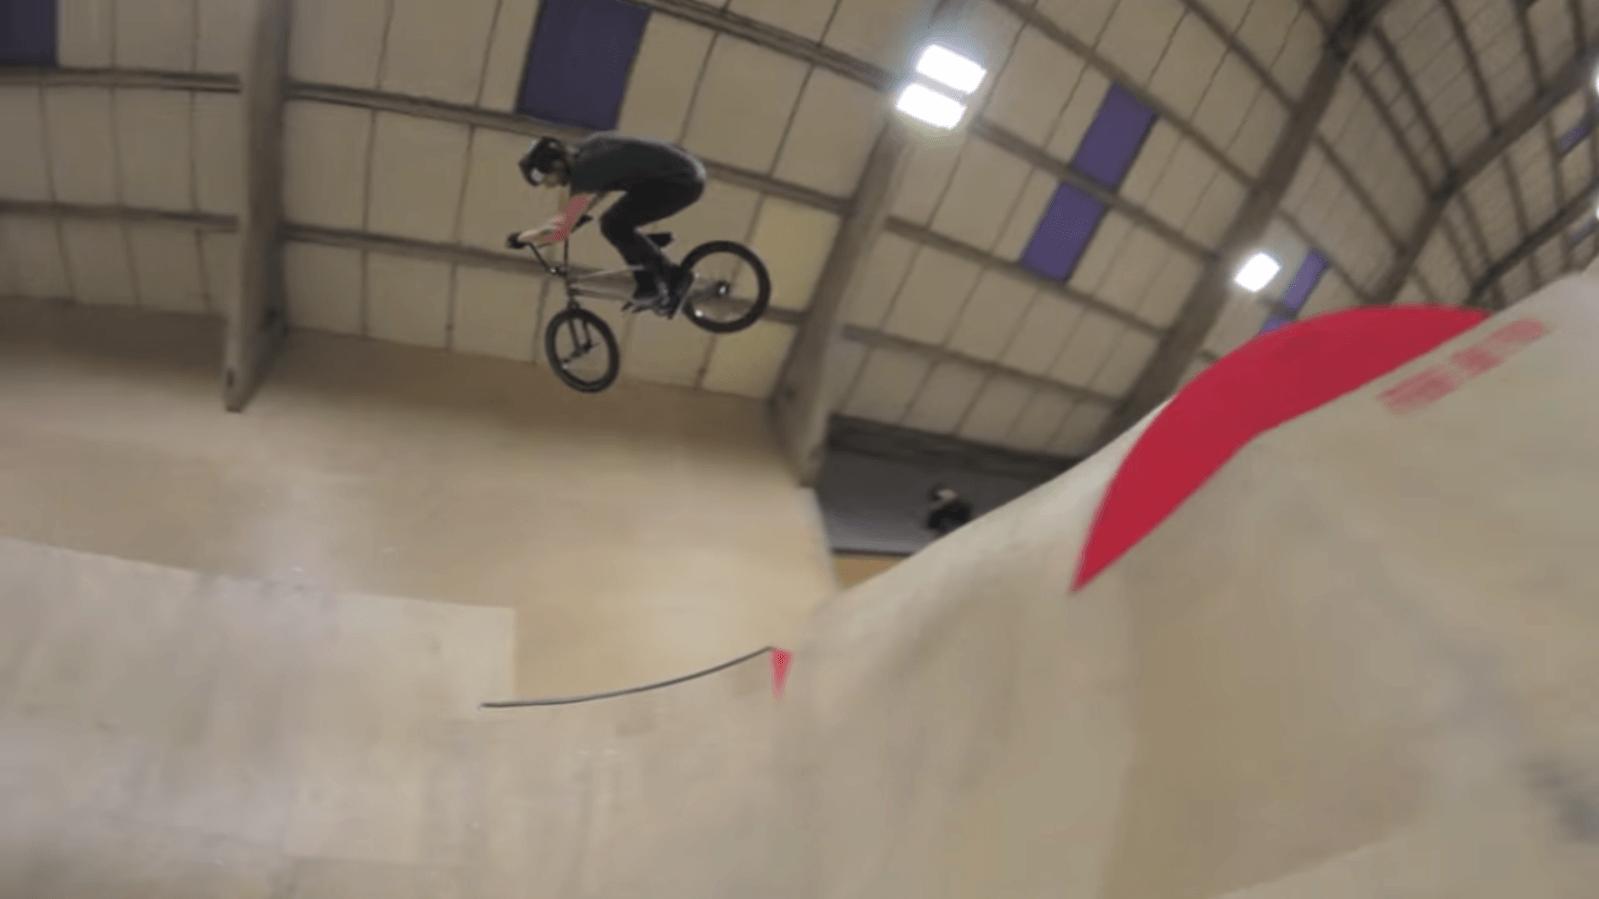 Jason Phelan: Full Speed in Corby's Bowl